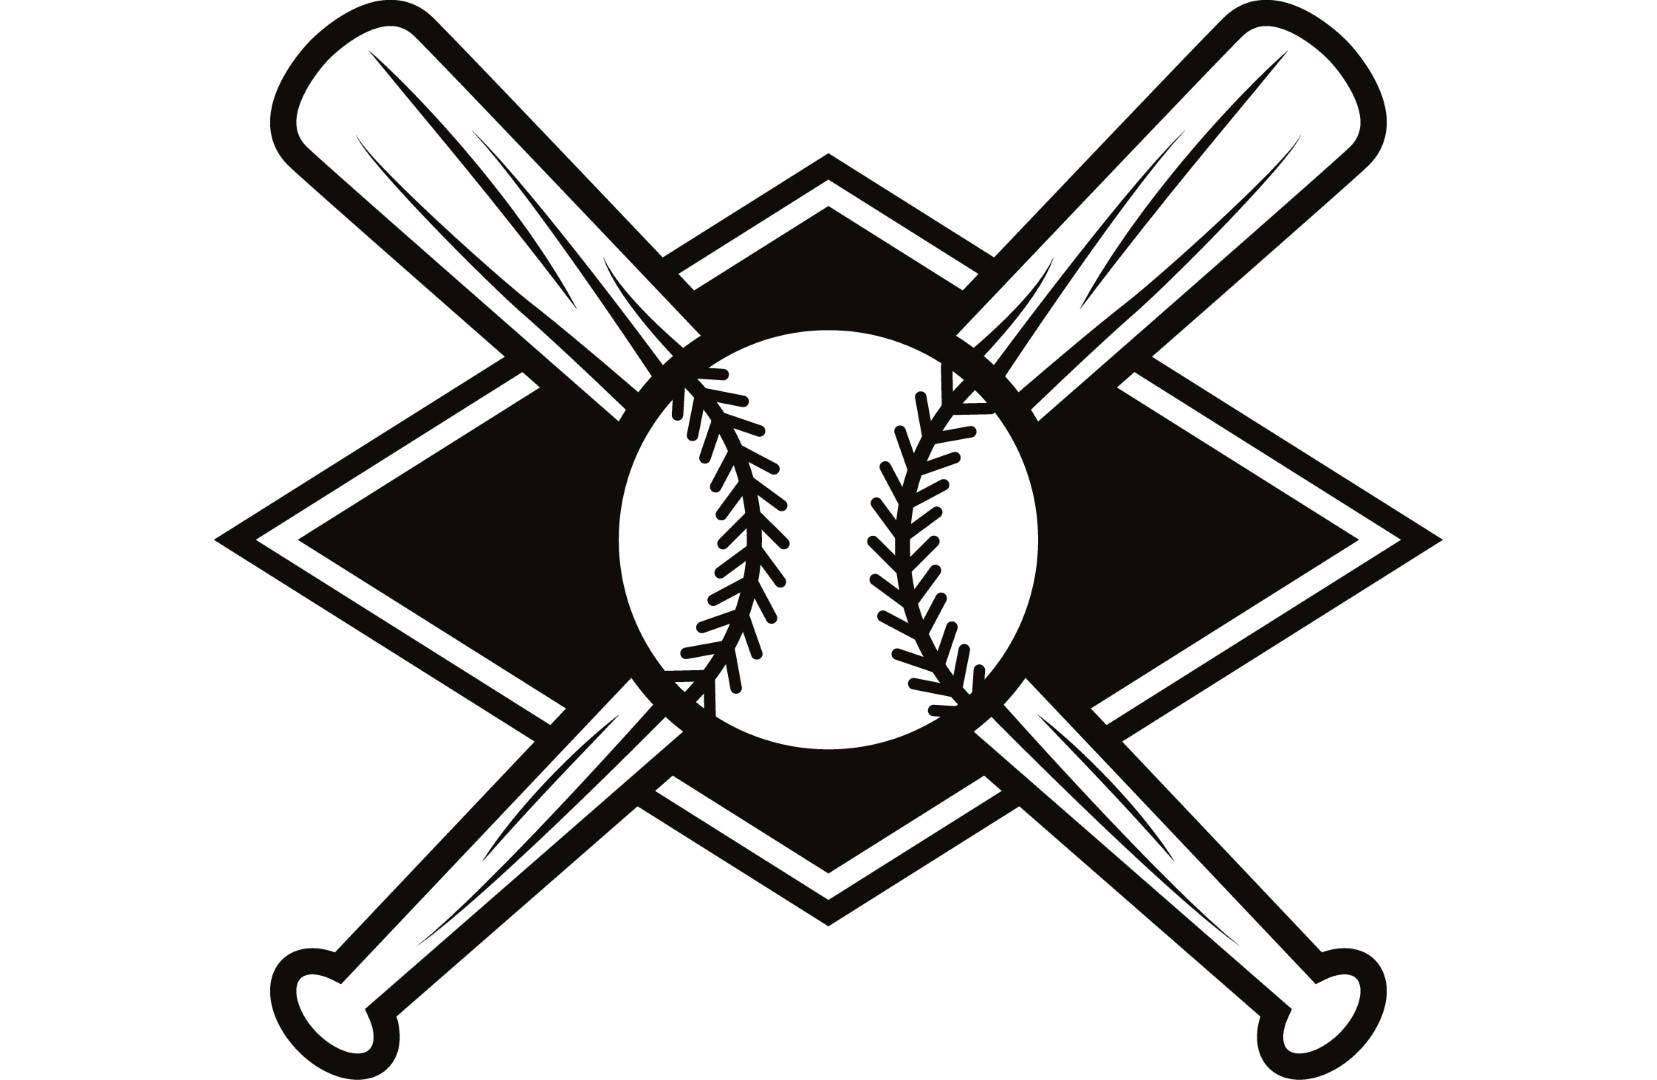 baseball logo 7 bats crossed ball diamond league equipment fun clip art free images fun clip art free